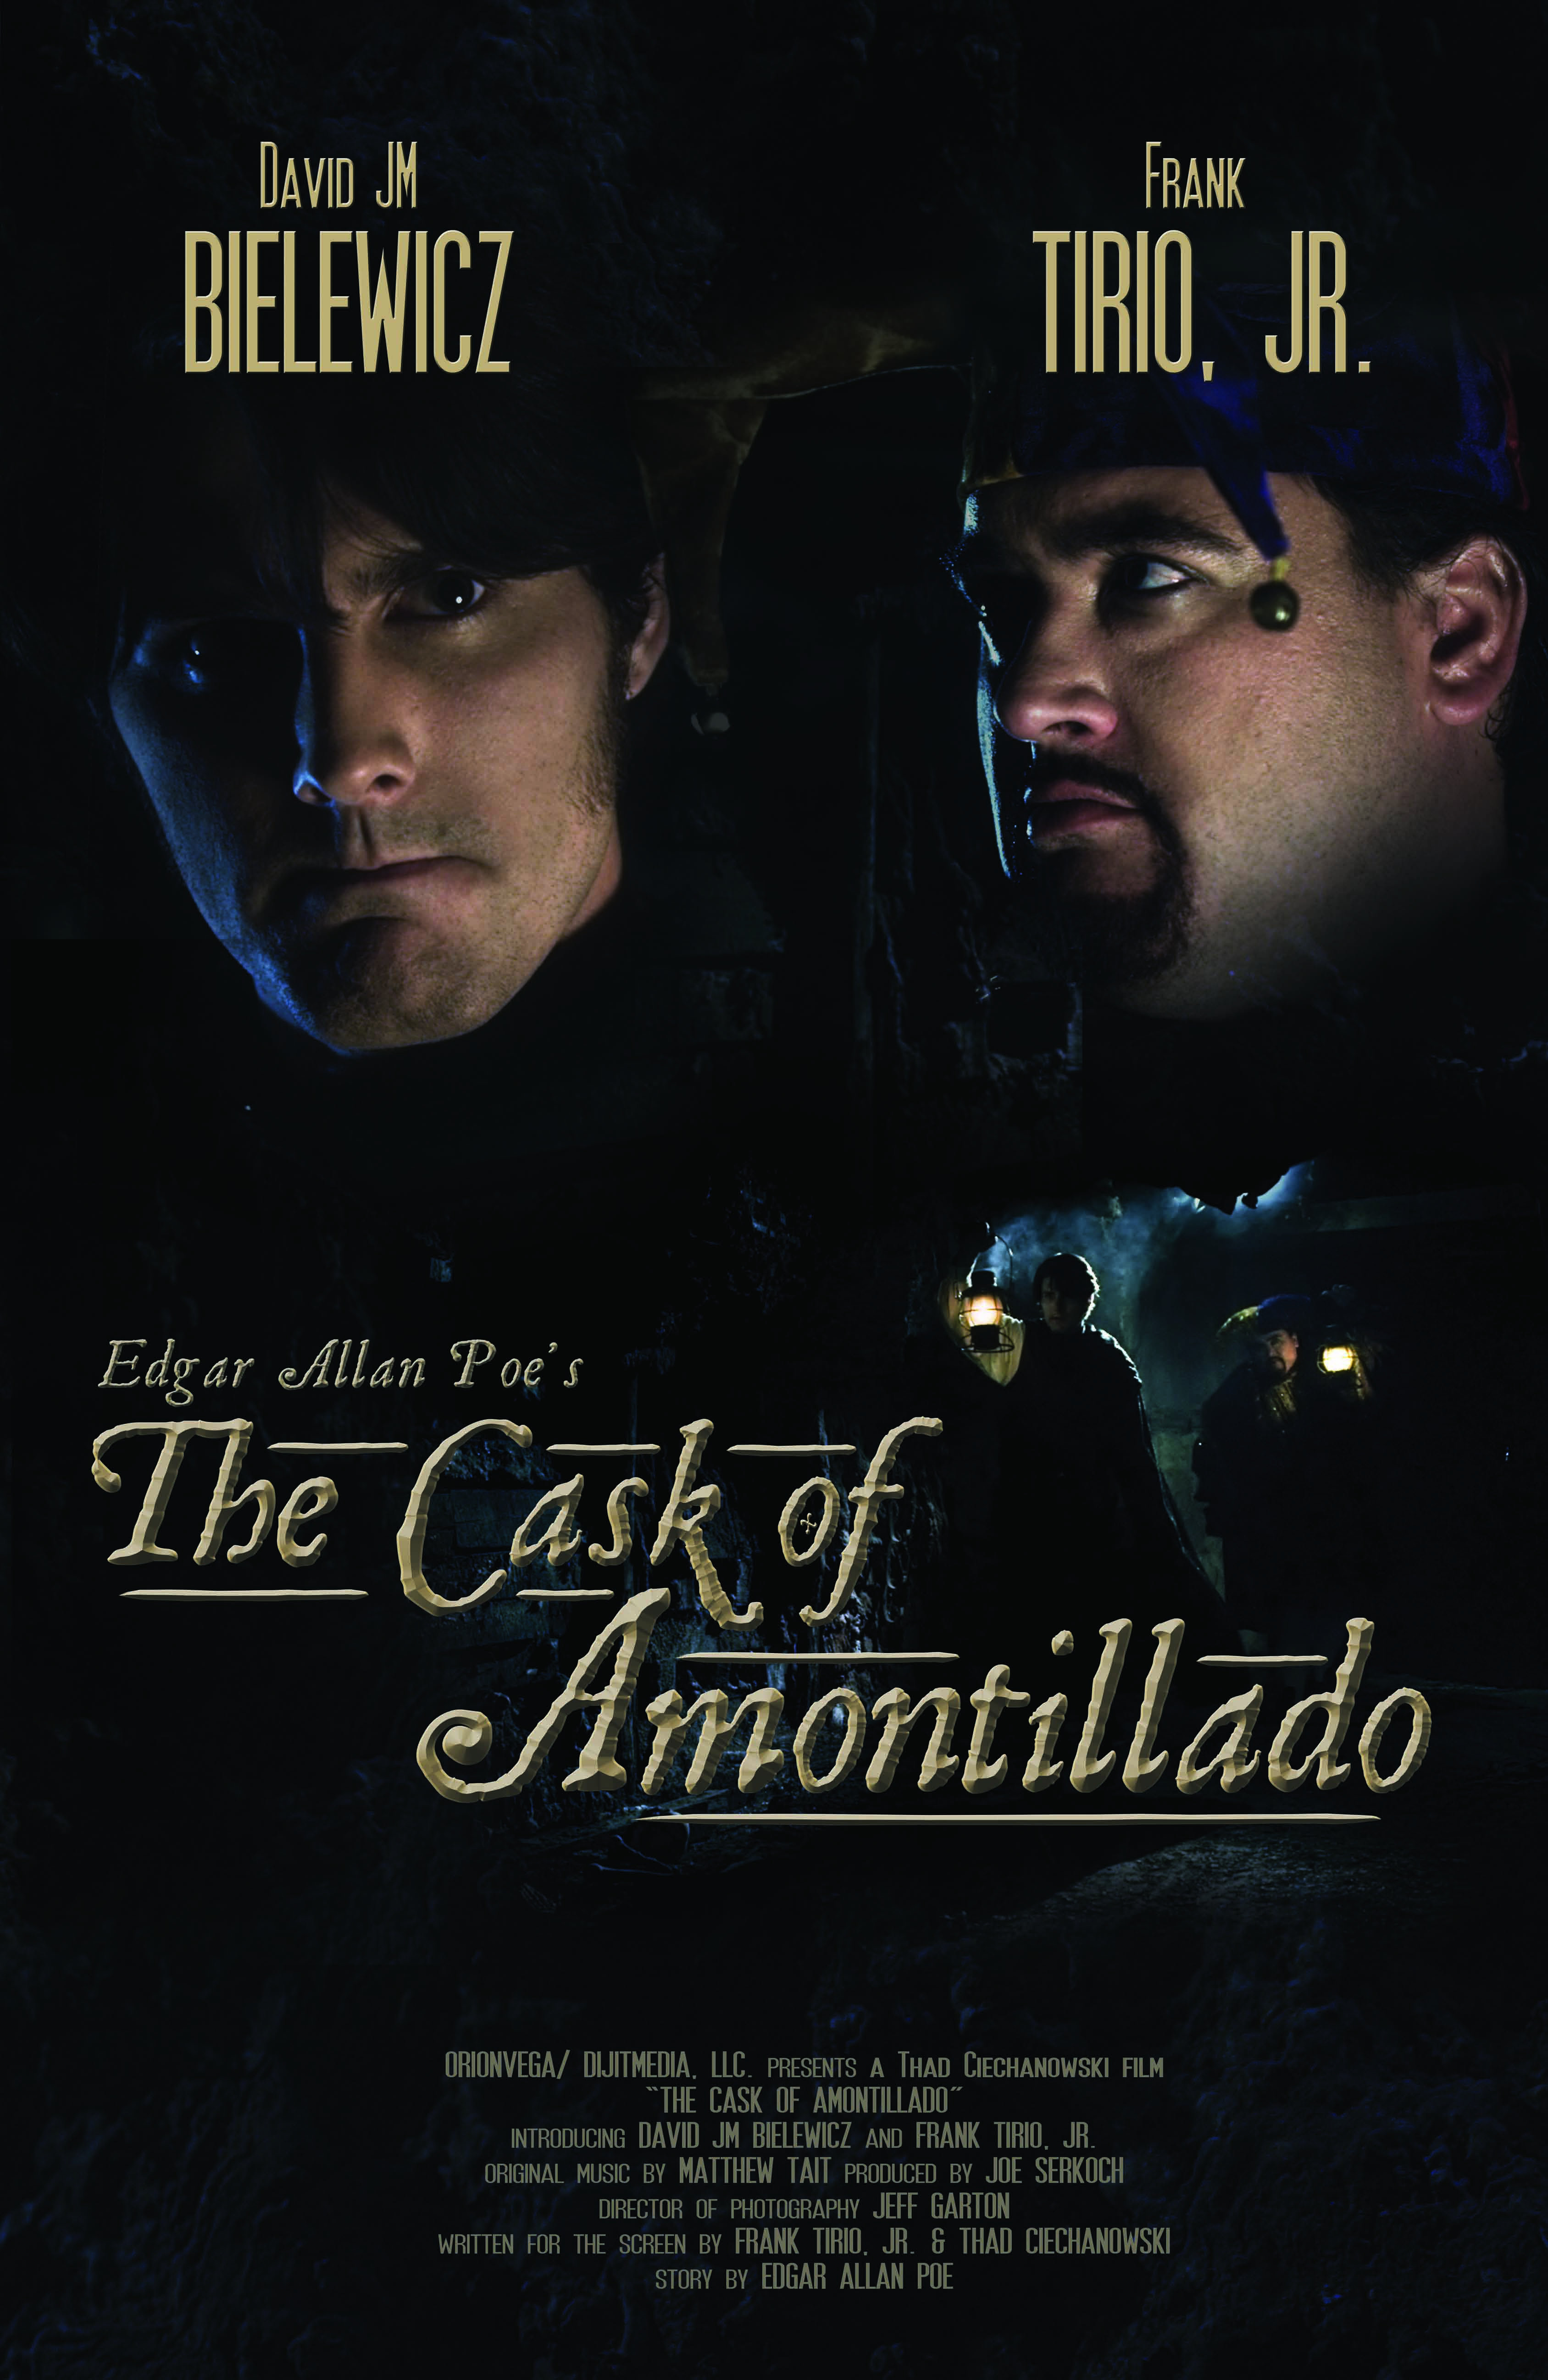 short story cask of amontillado